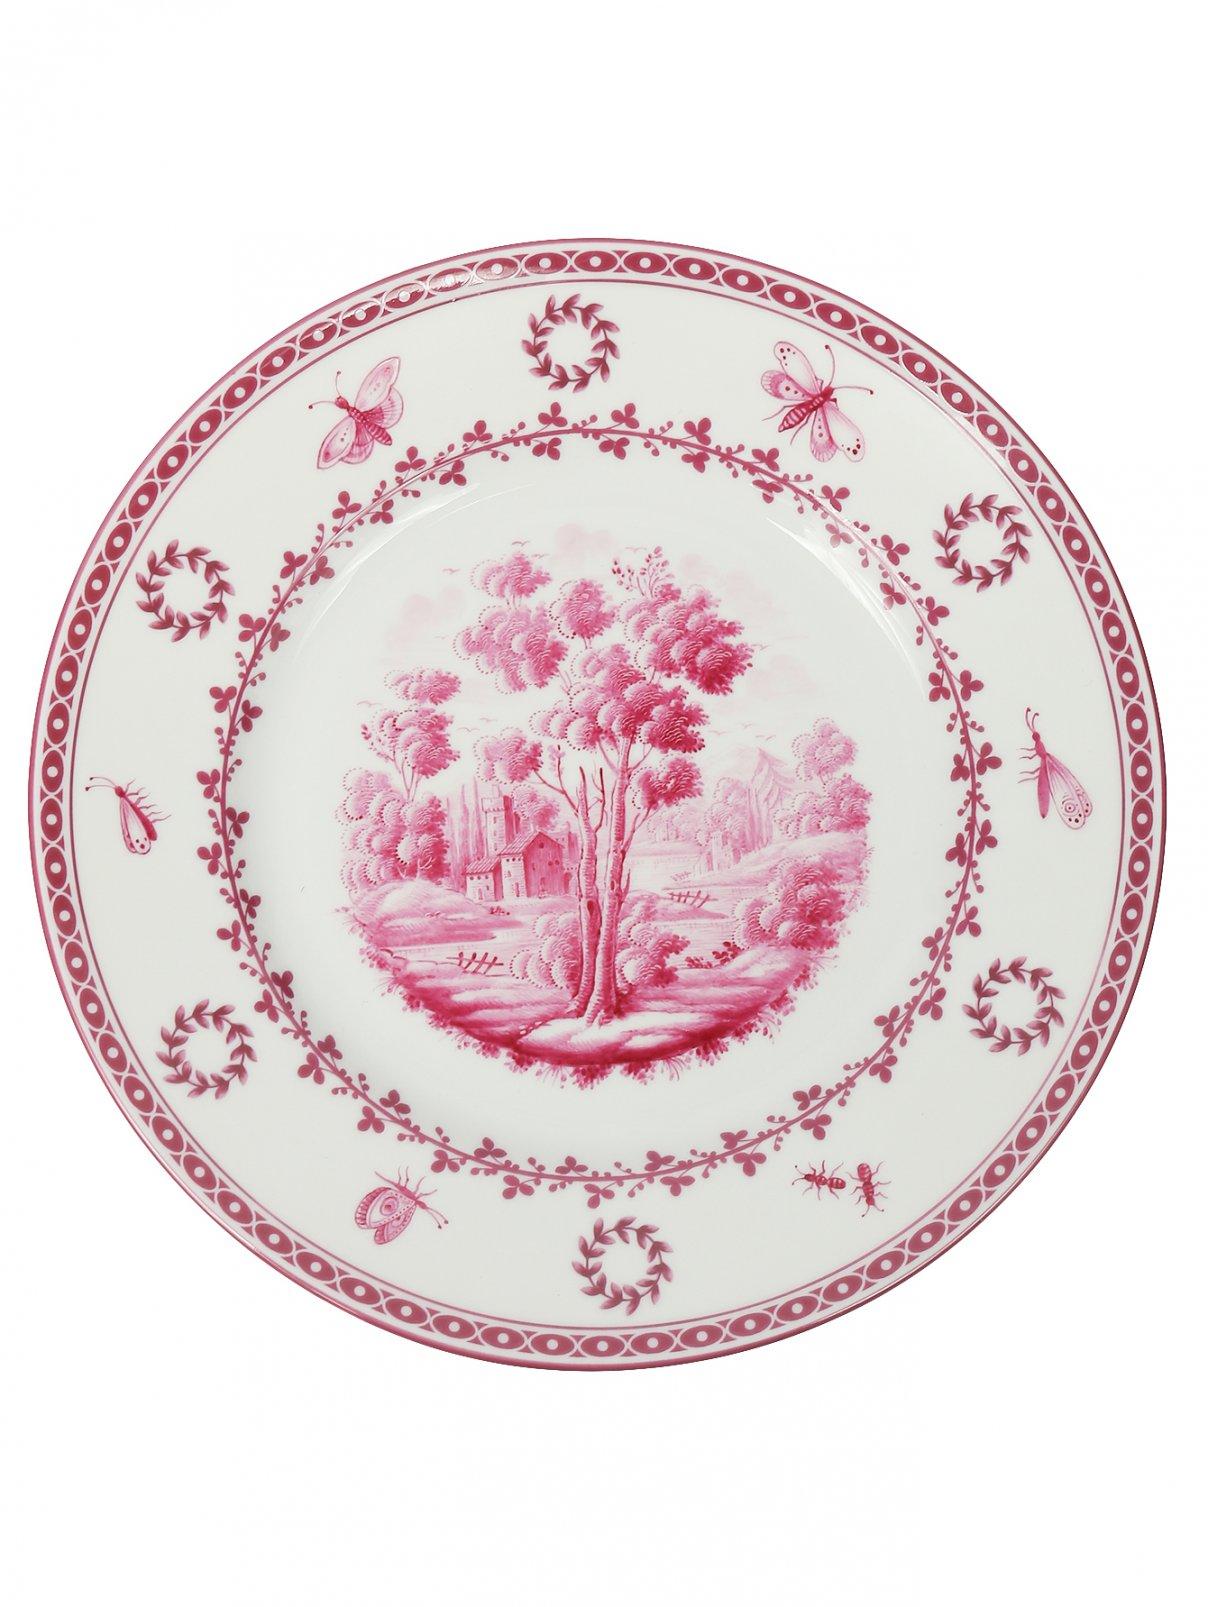 Тарелка десертная  из фарфора с узором и орнаментом Richard Ginori 1735  –  Общий вид